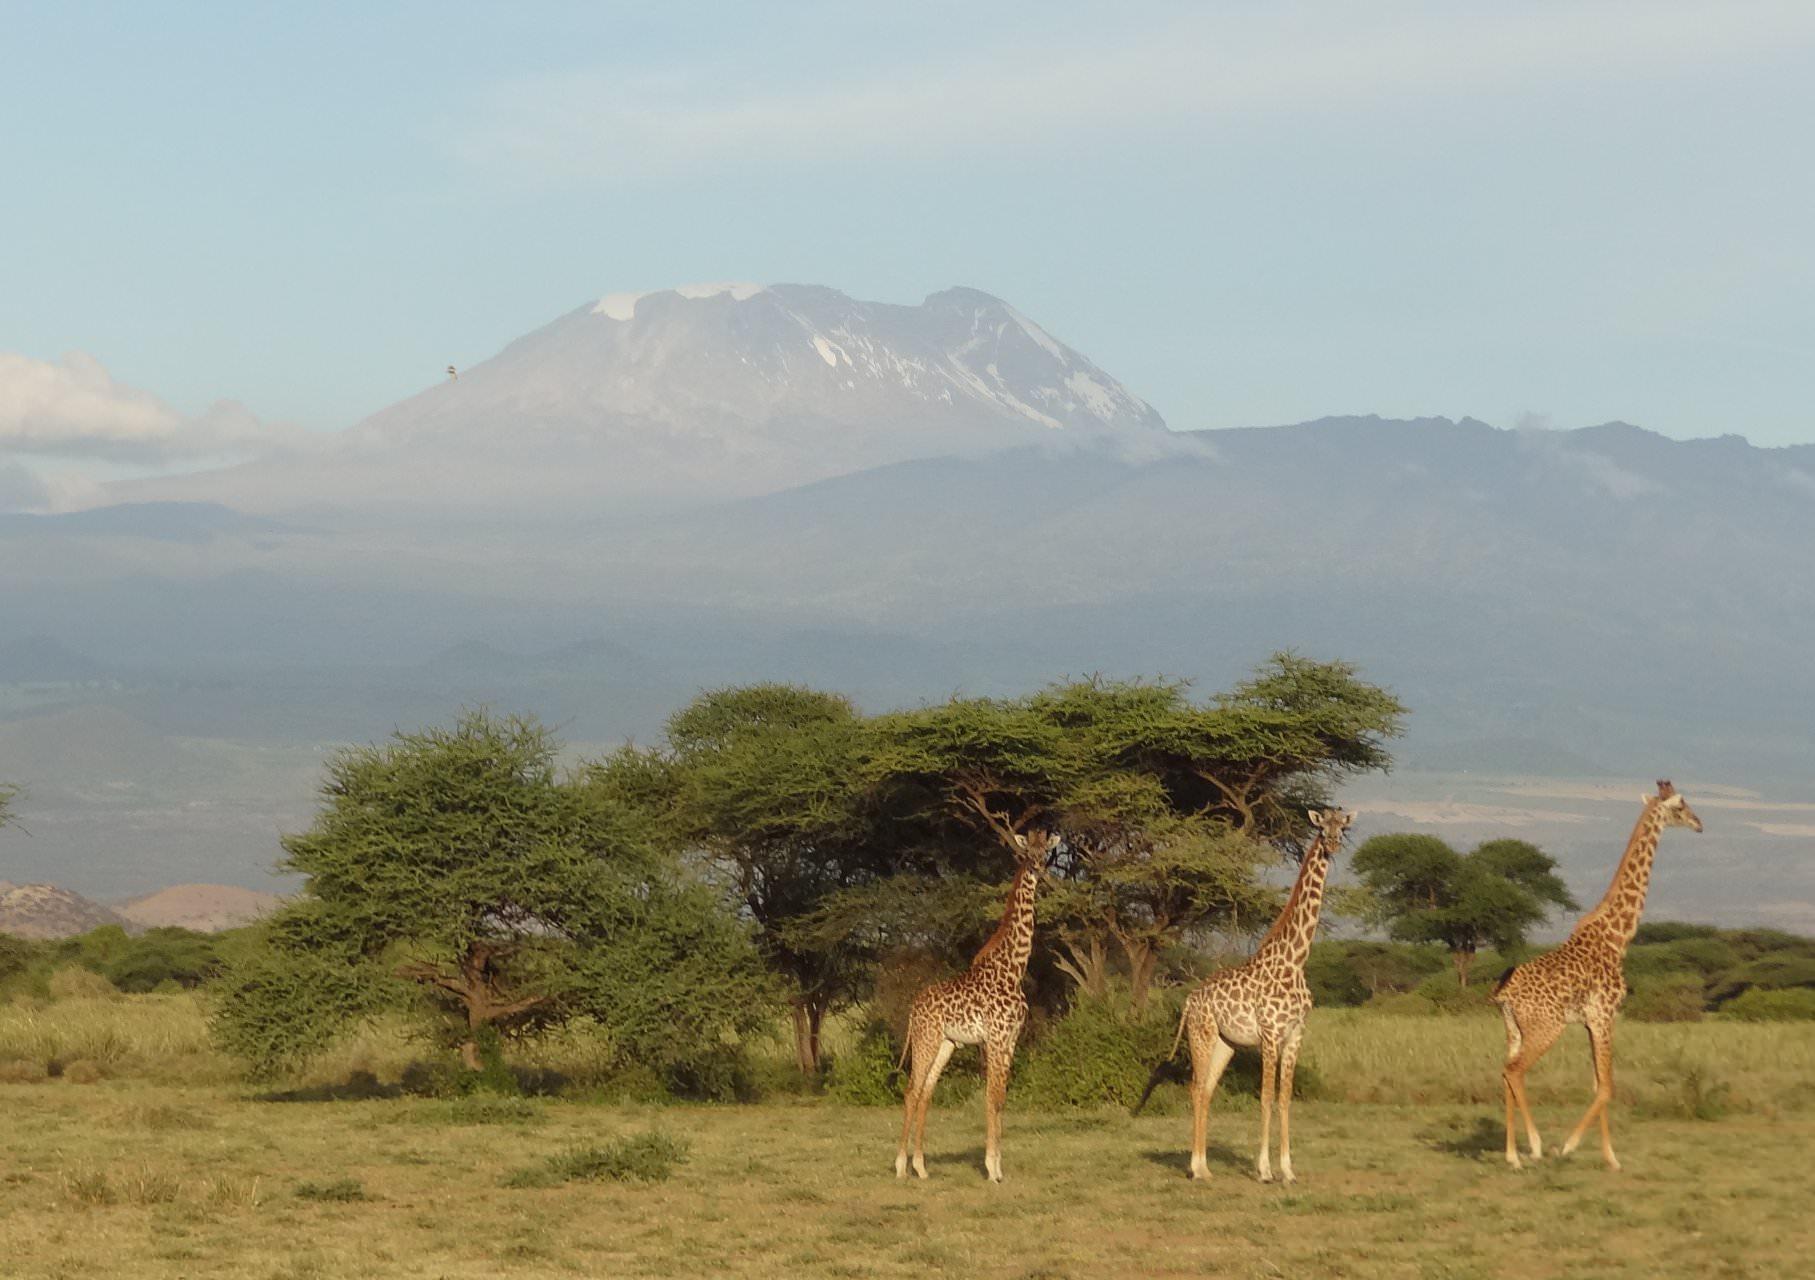 Journey of giraffe Mt Kilimanjaro